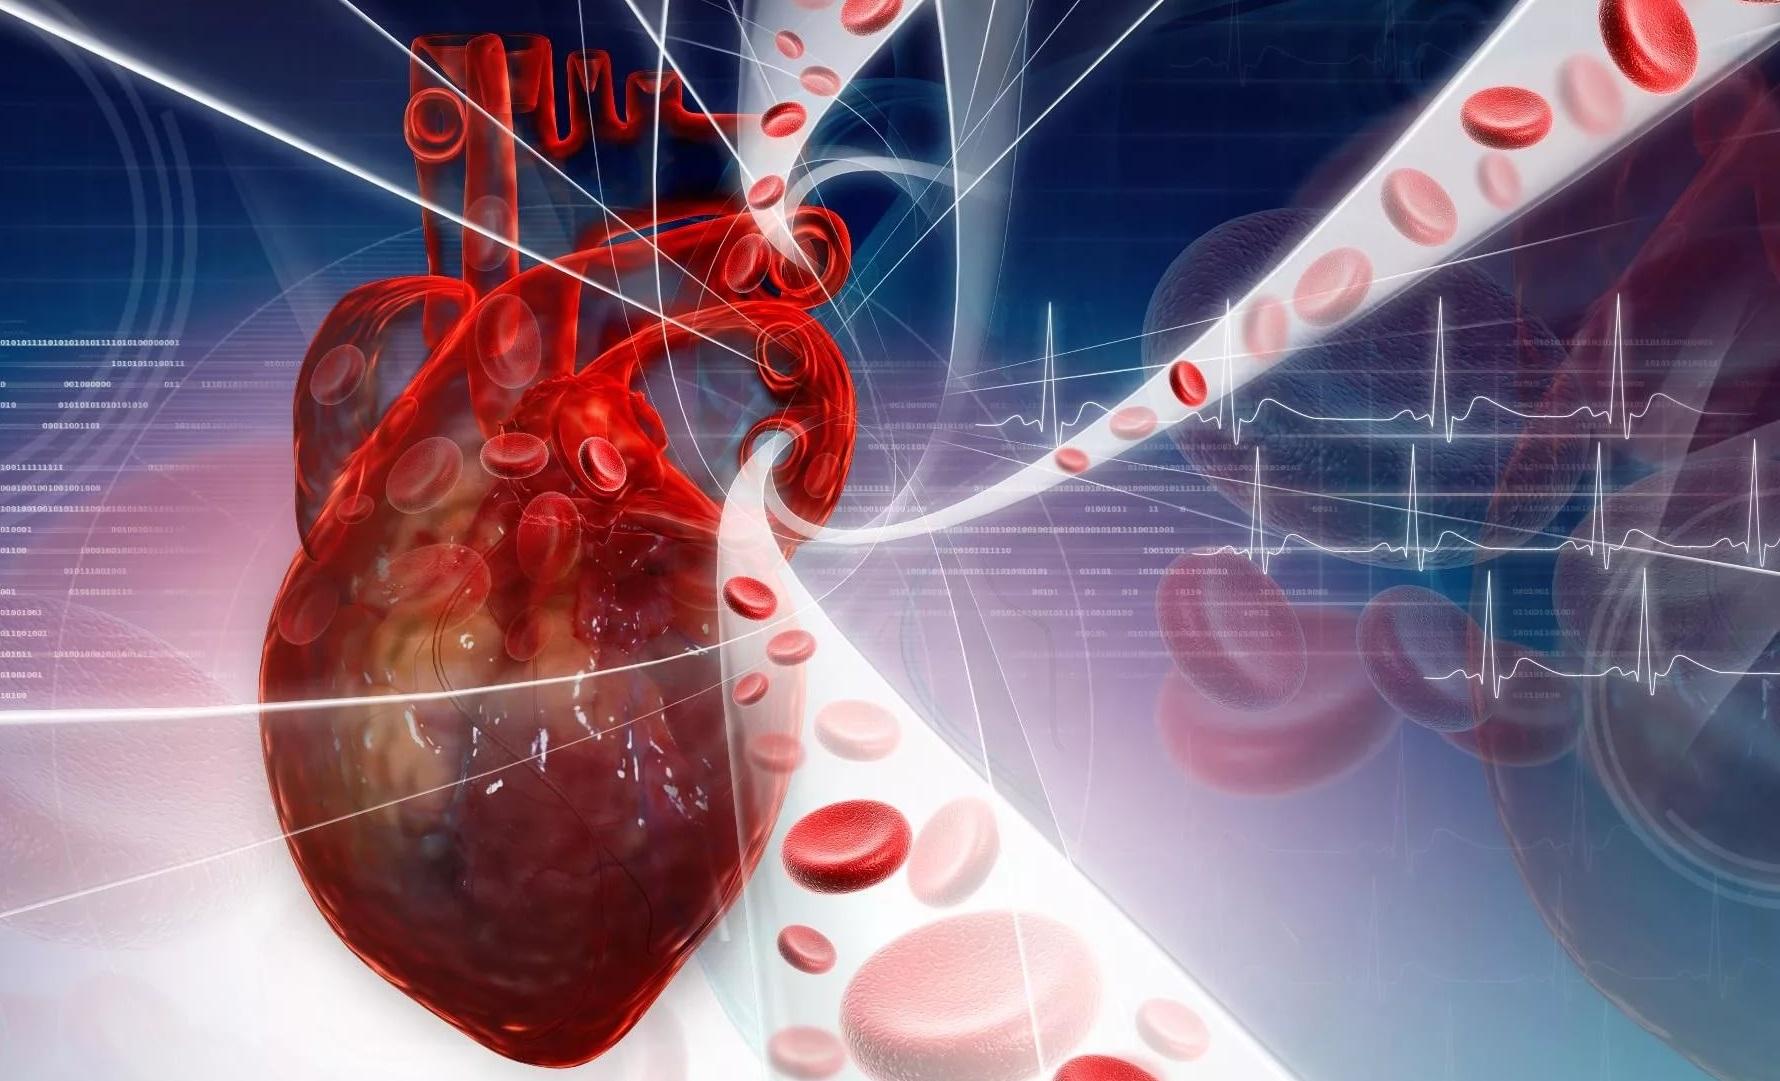 Сердце, эритроциты, сосуды